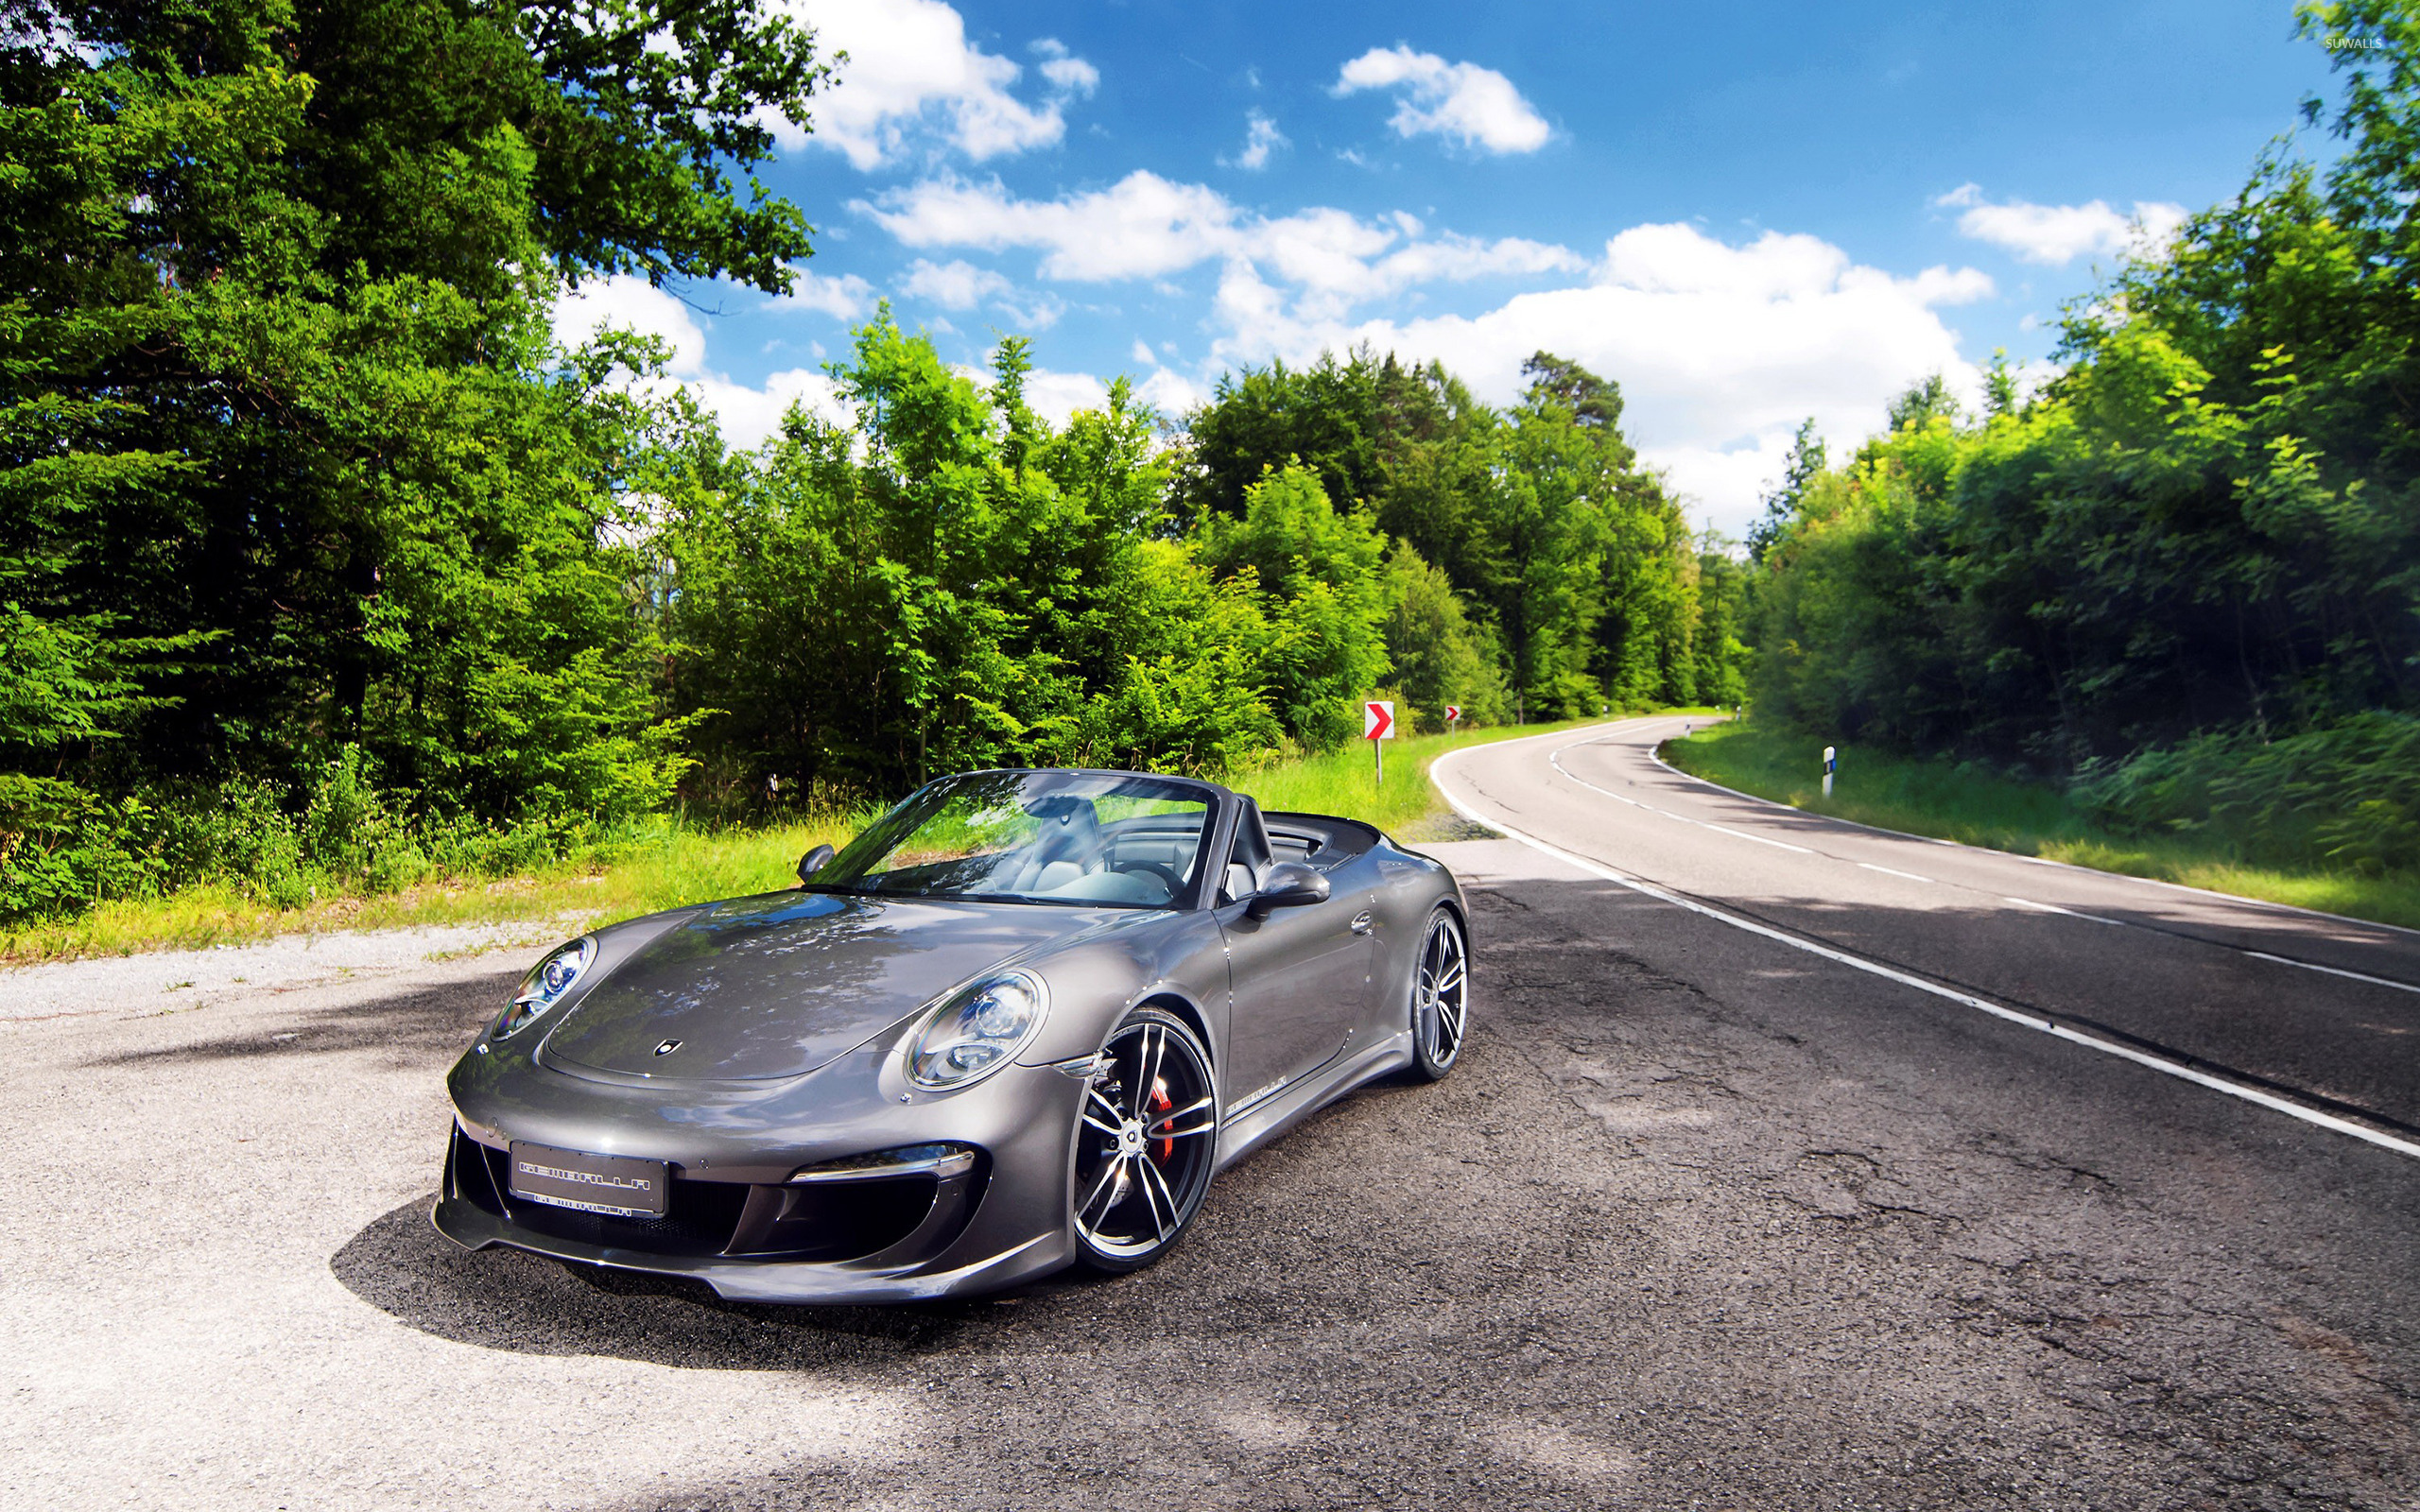 Porsche 911 Carrera дорога бесплатно